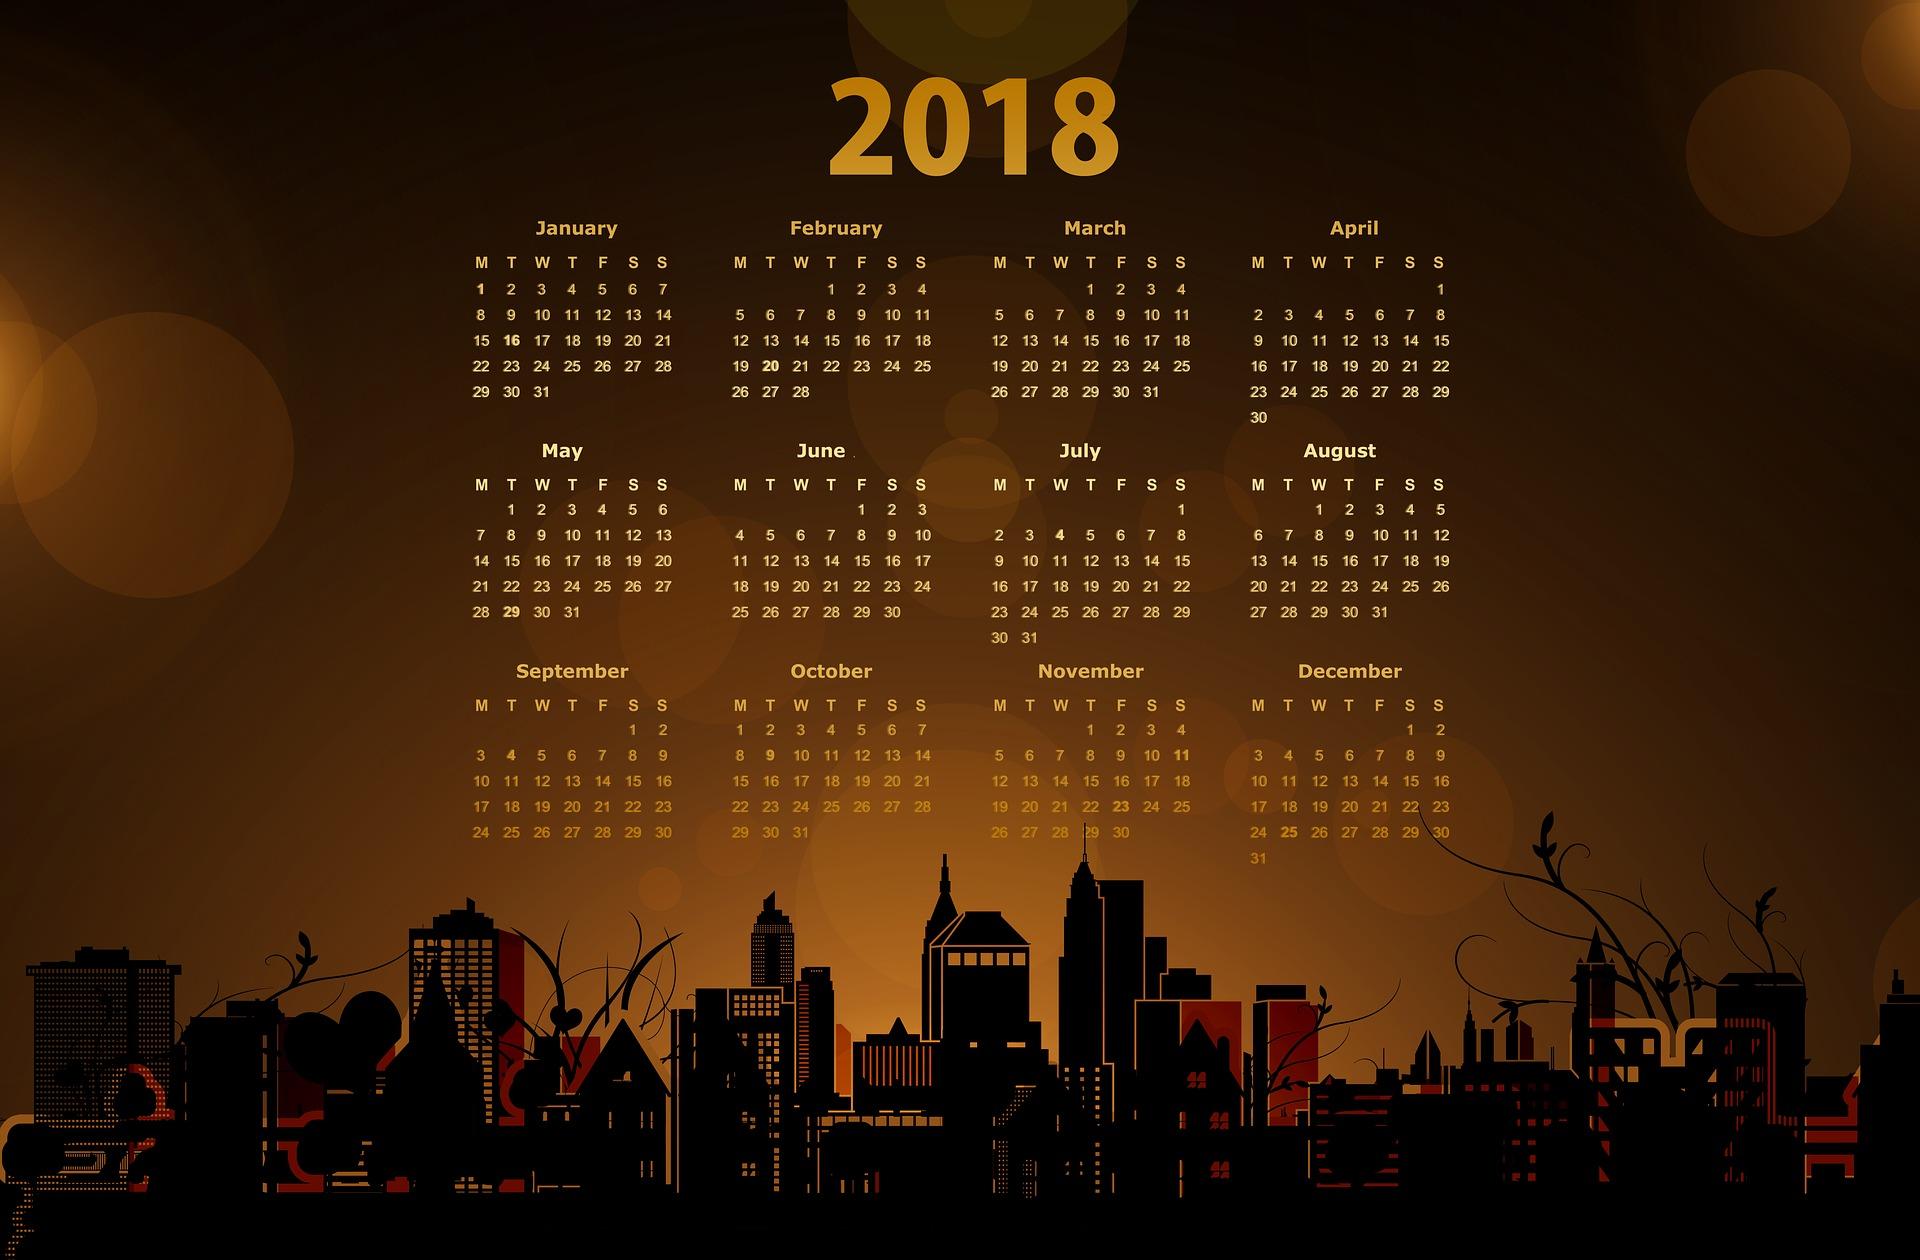 calendar-2308926_1920